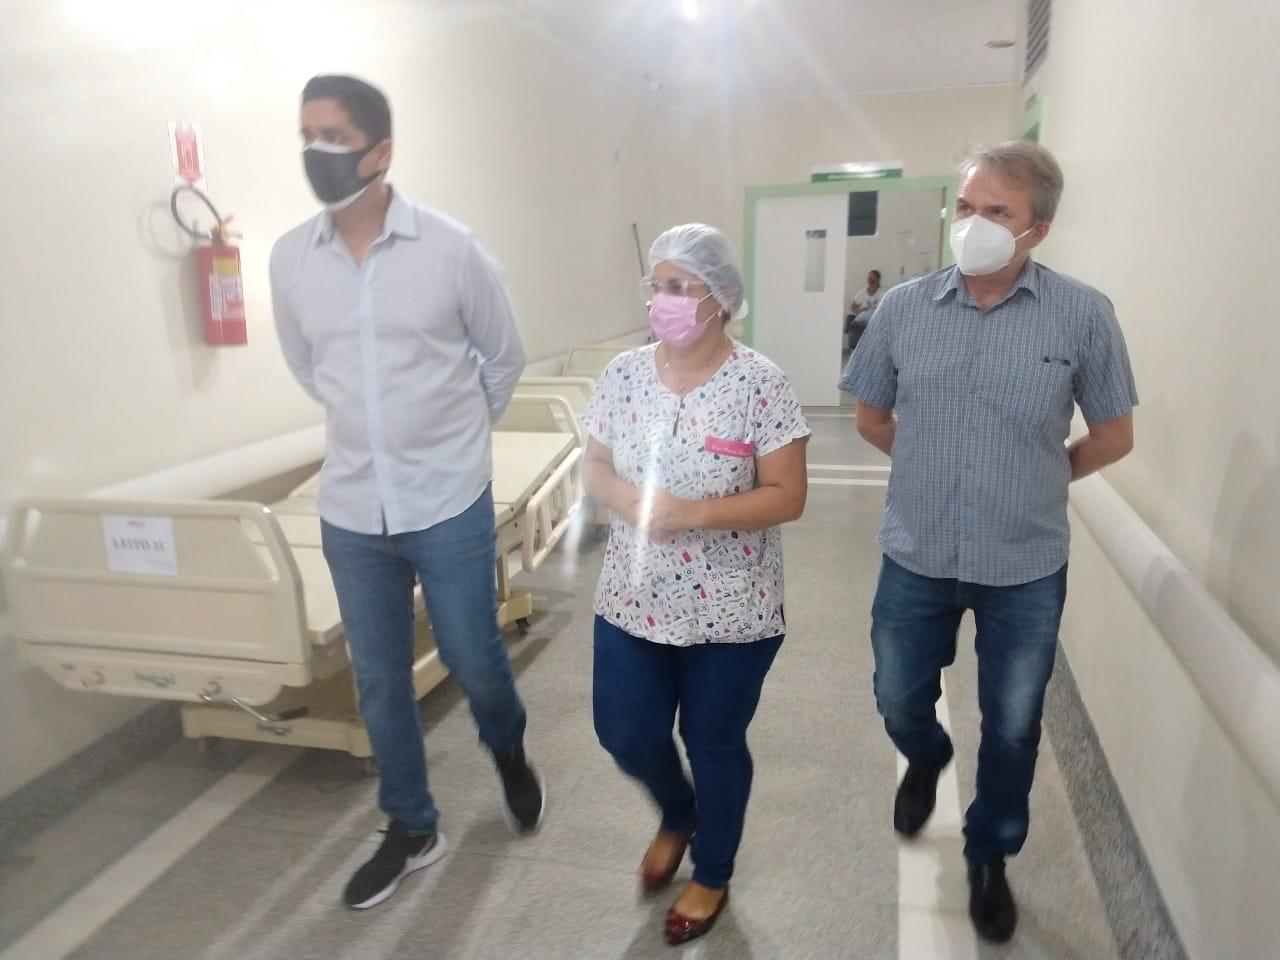 Sindicalistas encontram irregularidades na UPA do Segundo Distrito